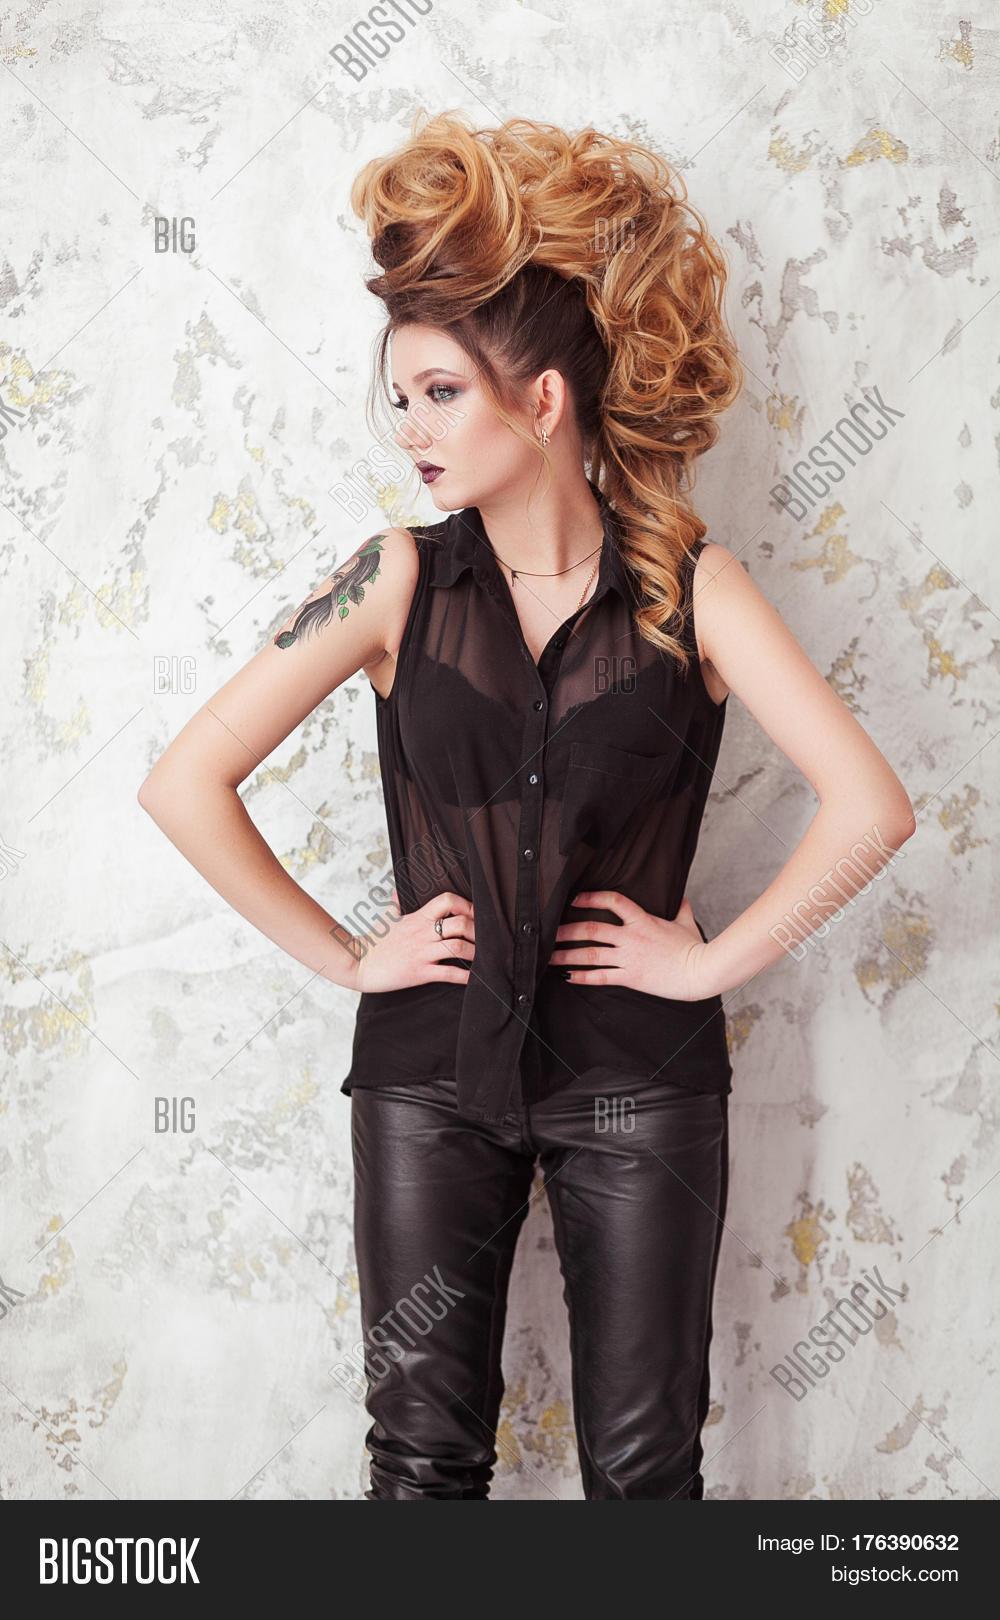 Fashion Shiny Makeup. Image & Photo (Free Trial)  Bigstock